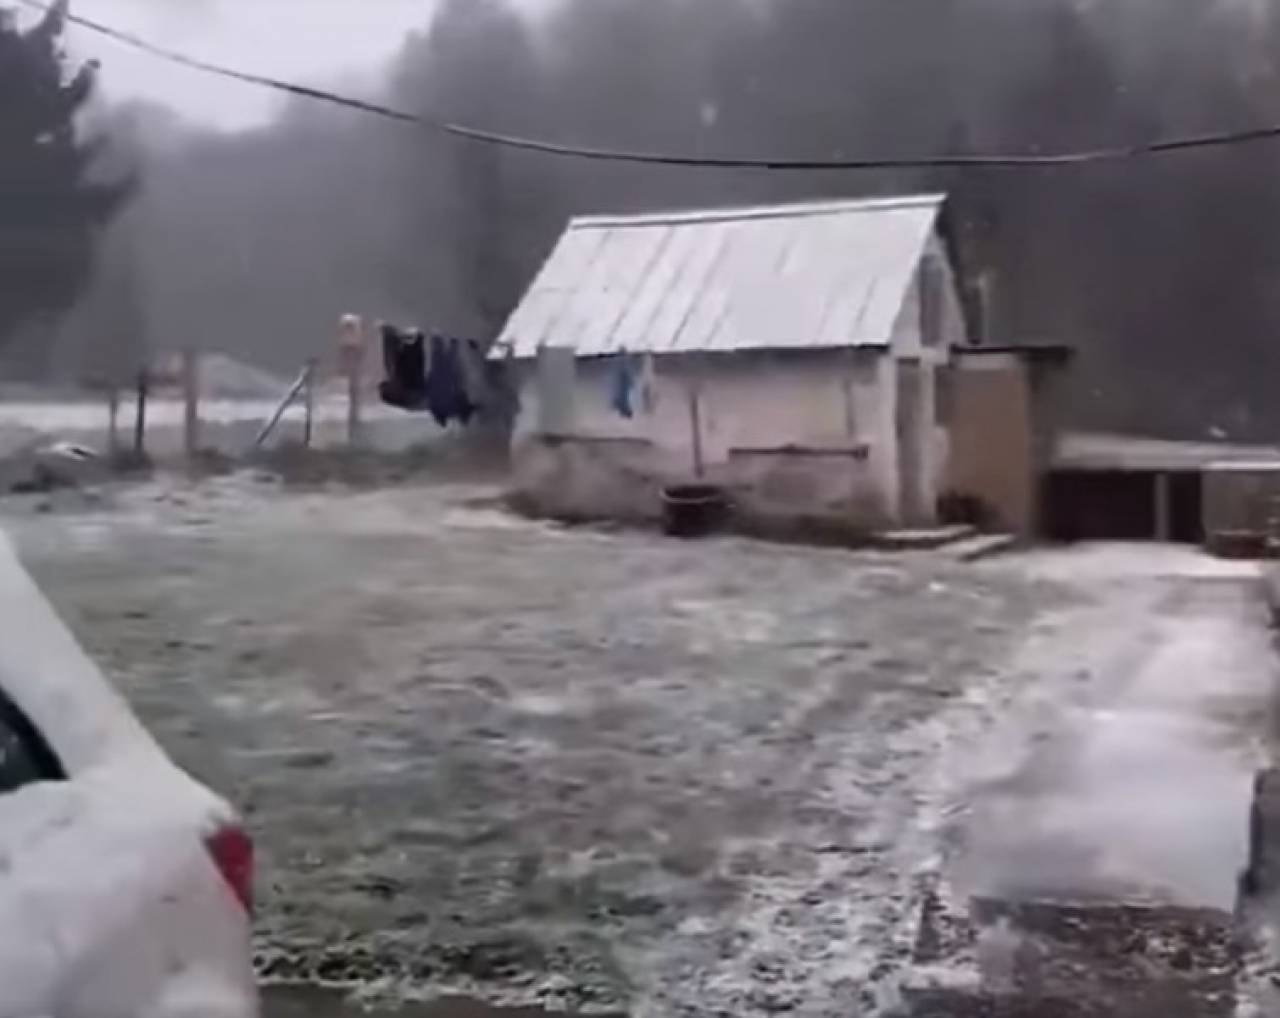 METEO > Gelo e NEVE in Lussemburgo. Una domenica invernale [VIDEO]